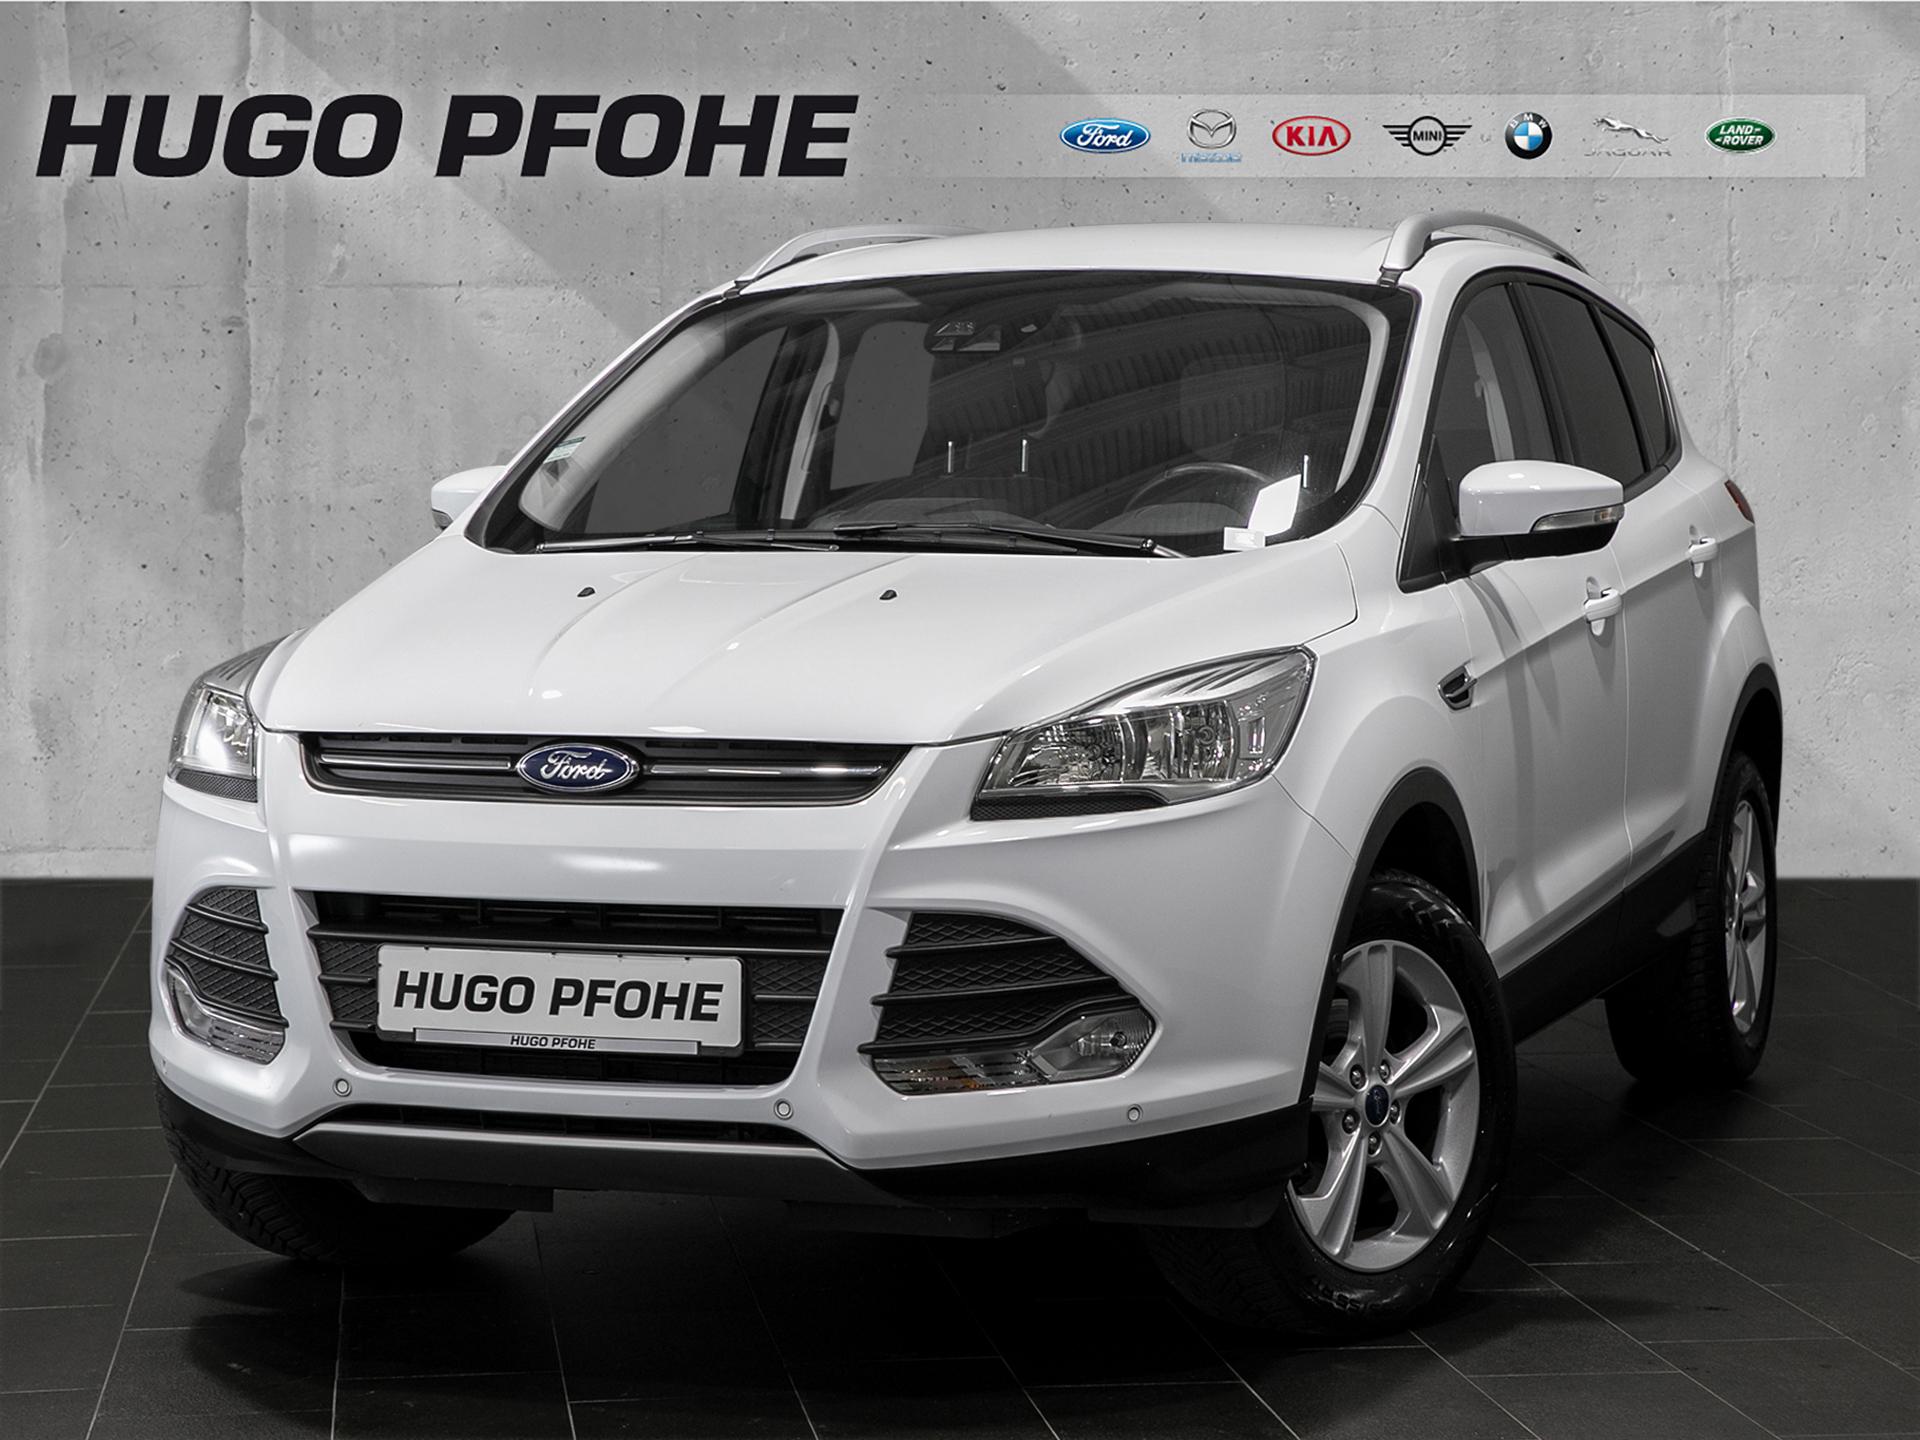 Ford Kuga SYNC Edition 1.5 EcoBoost *nur 20.332 Km*, Jahr 2016, Benzin